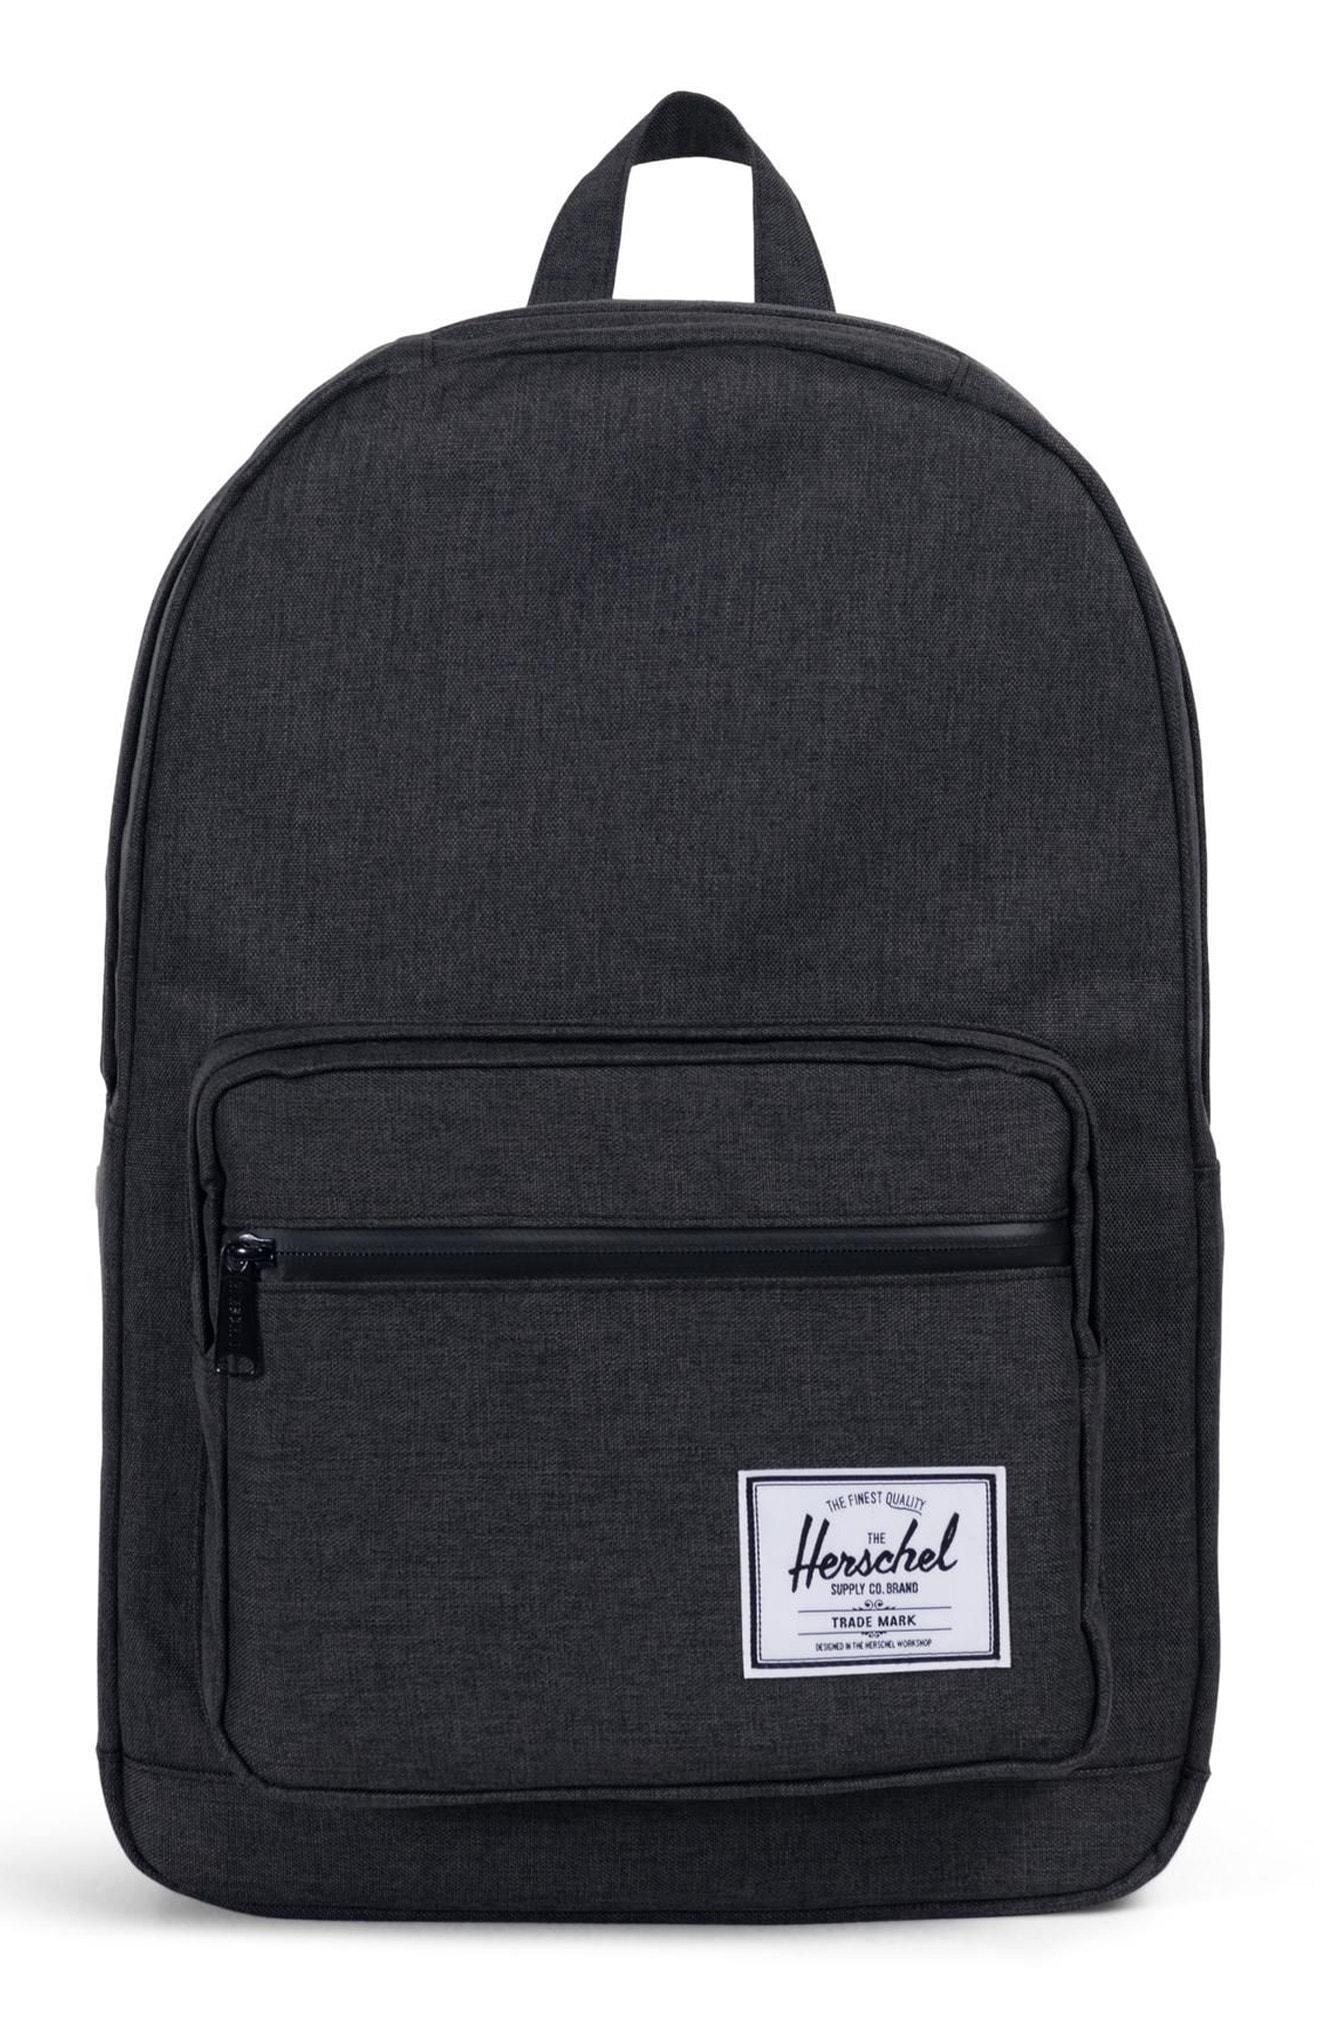 325da99a180 Lyst - Herschel Supply Co.  pop Quiz  Backpack in Black for Men ...